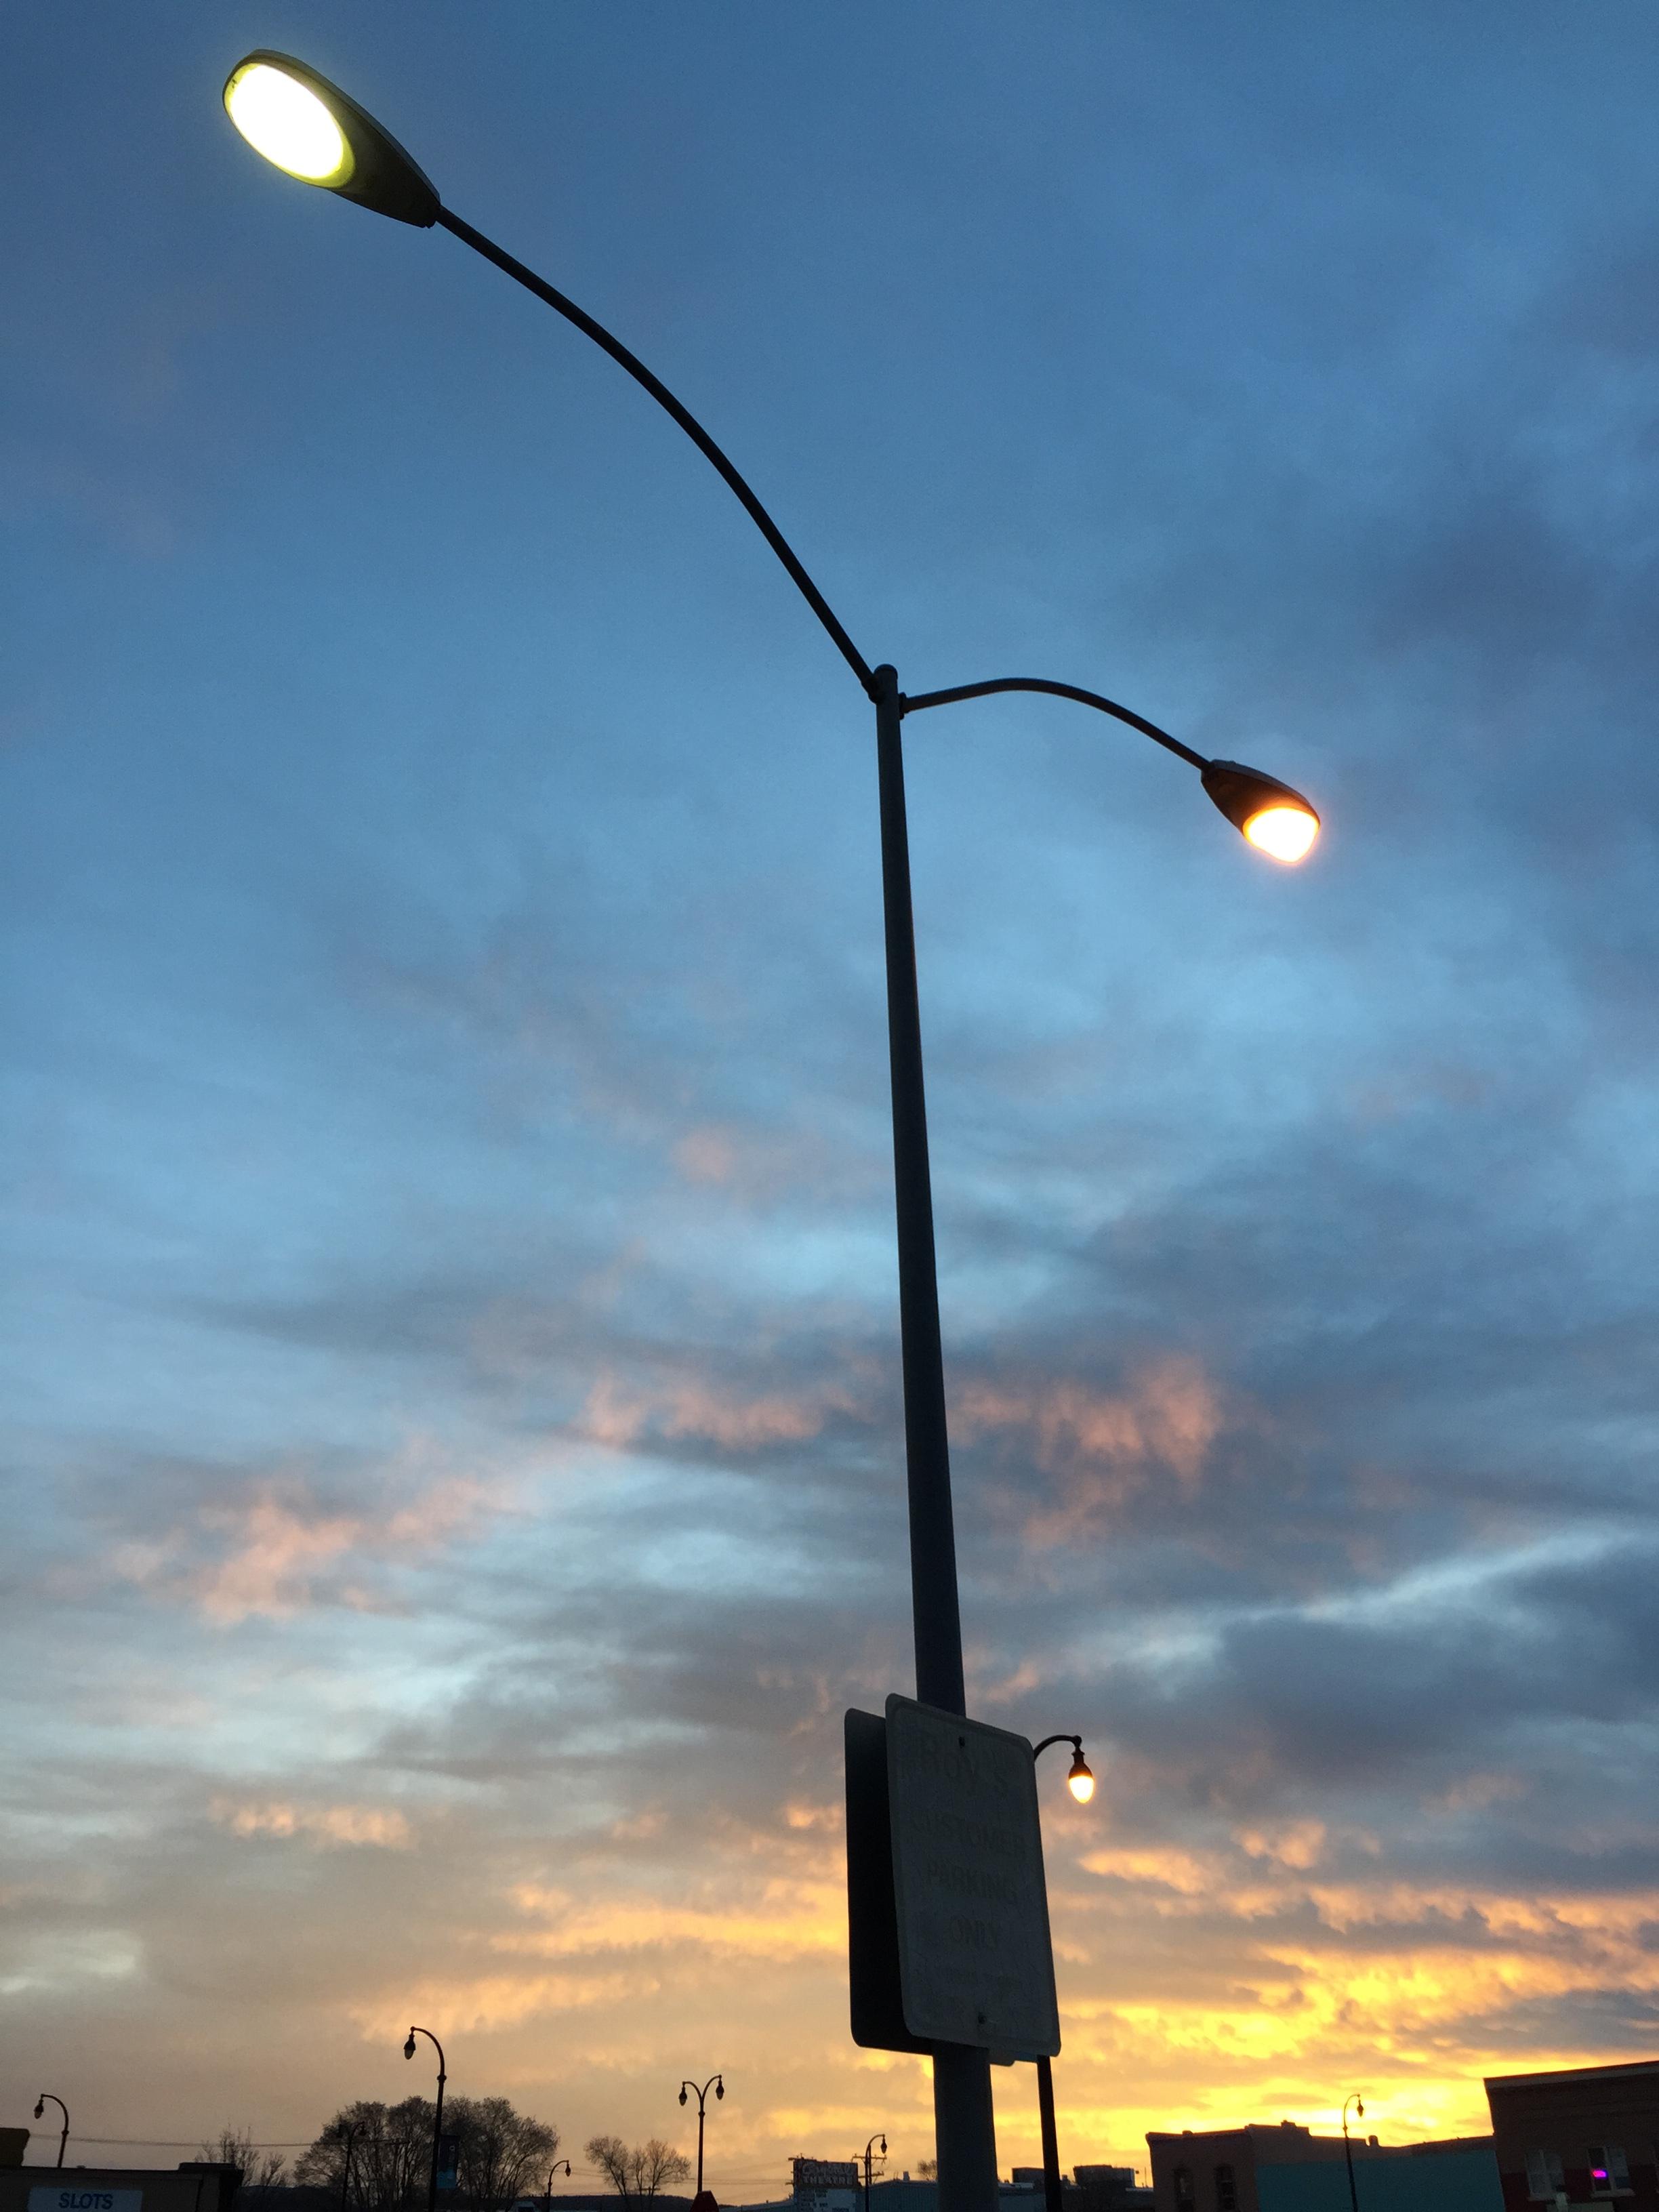 File:2015-02-14 06 37 40 Street light post with both sodium vapor ...